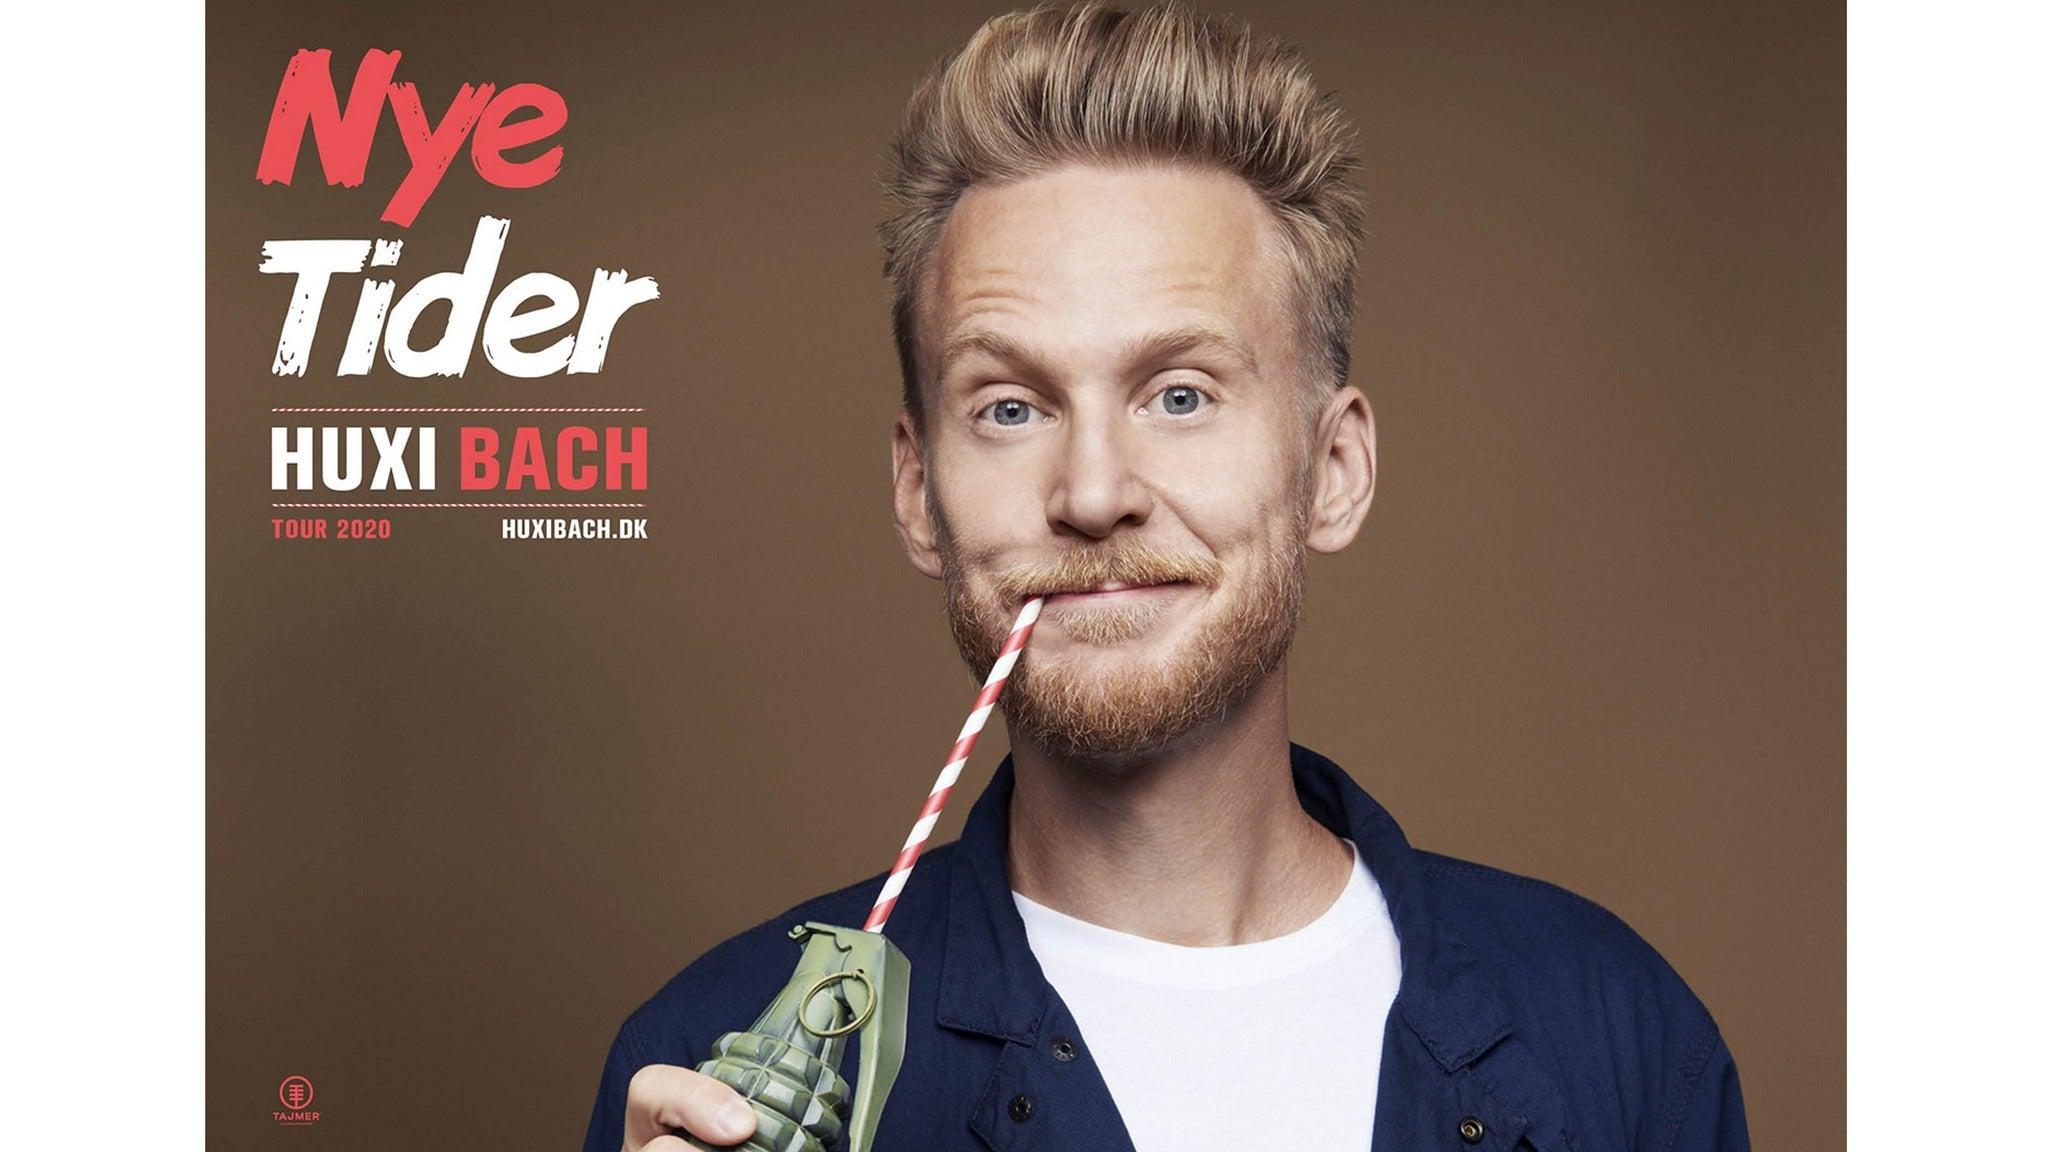 Huxi Bach - Nye Tider